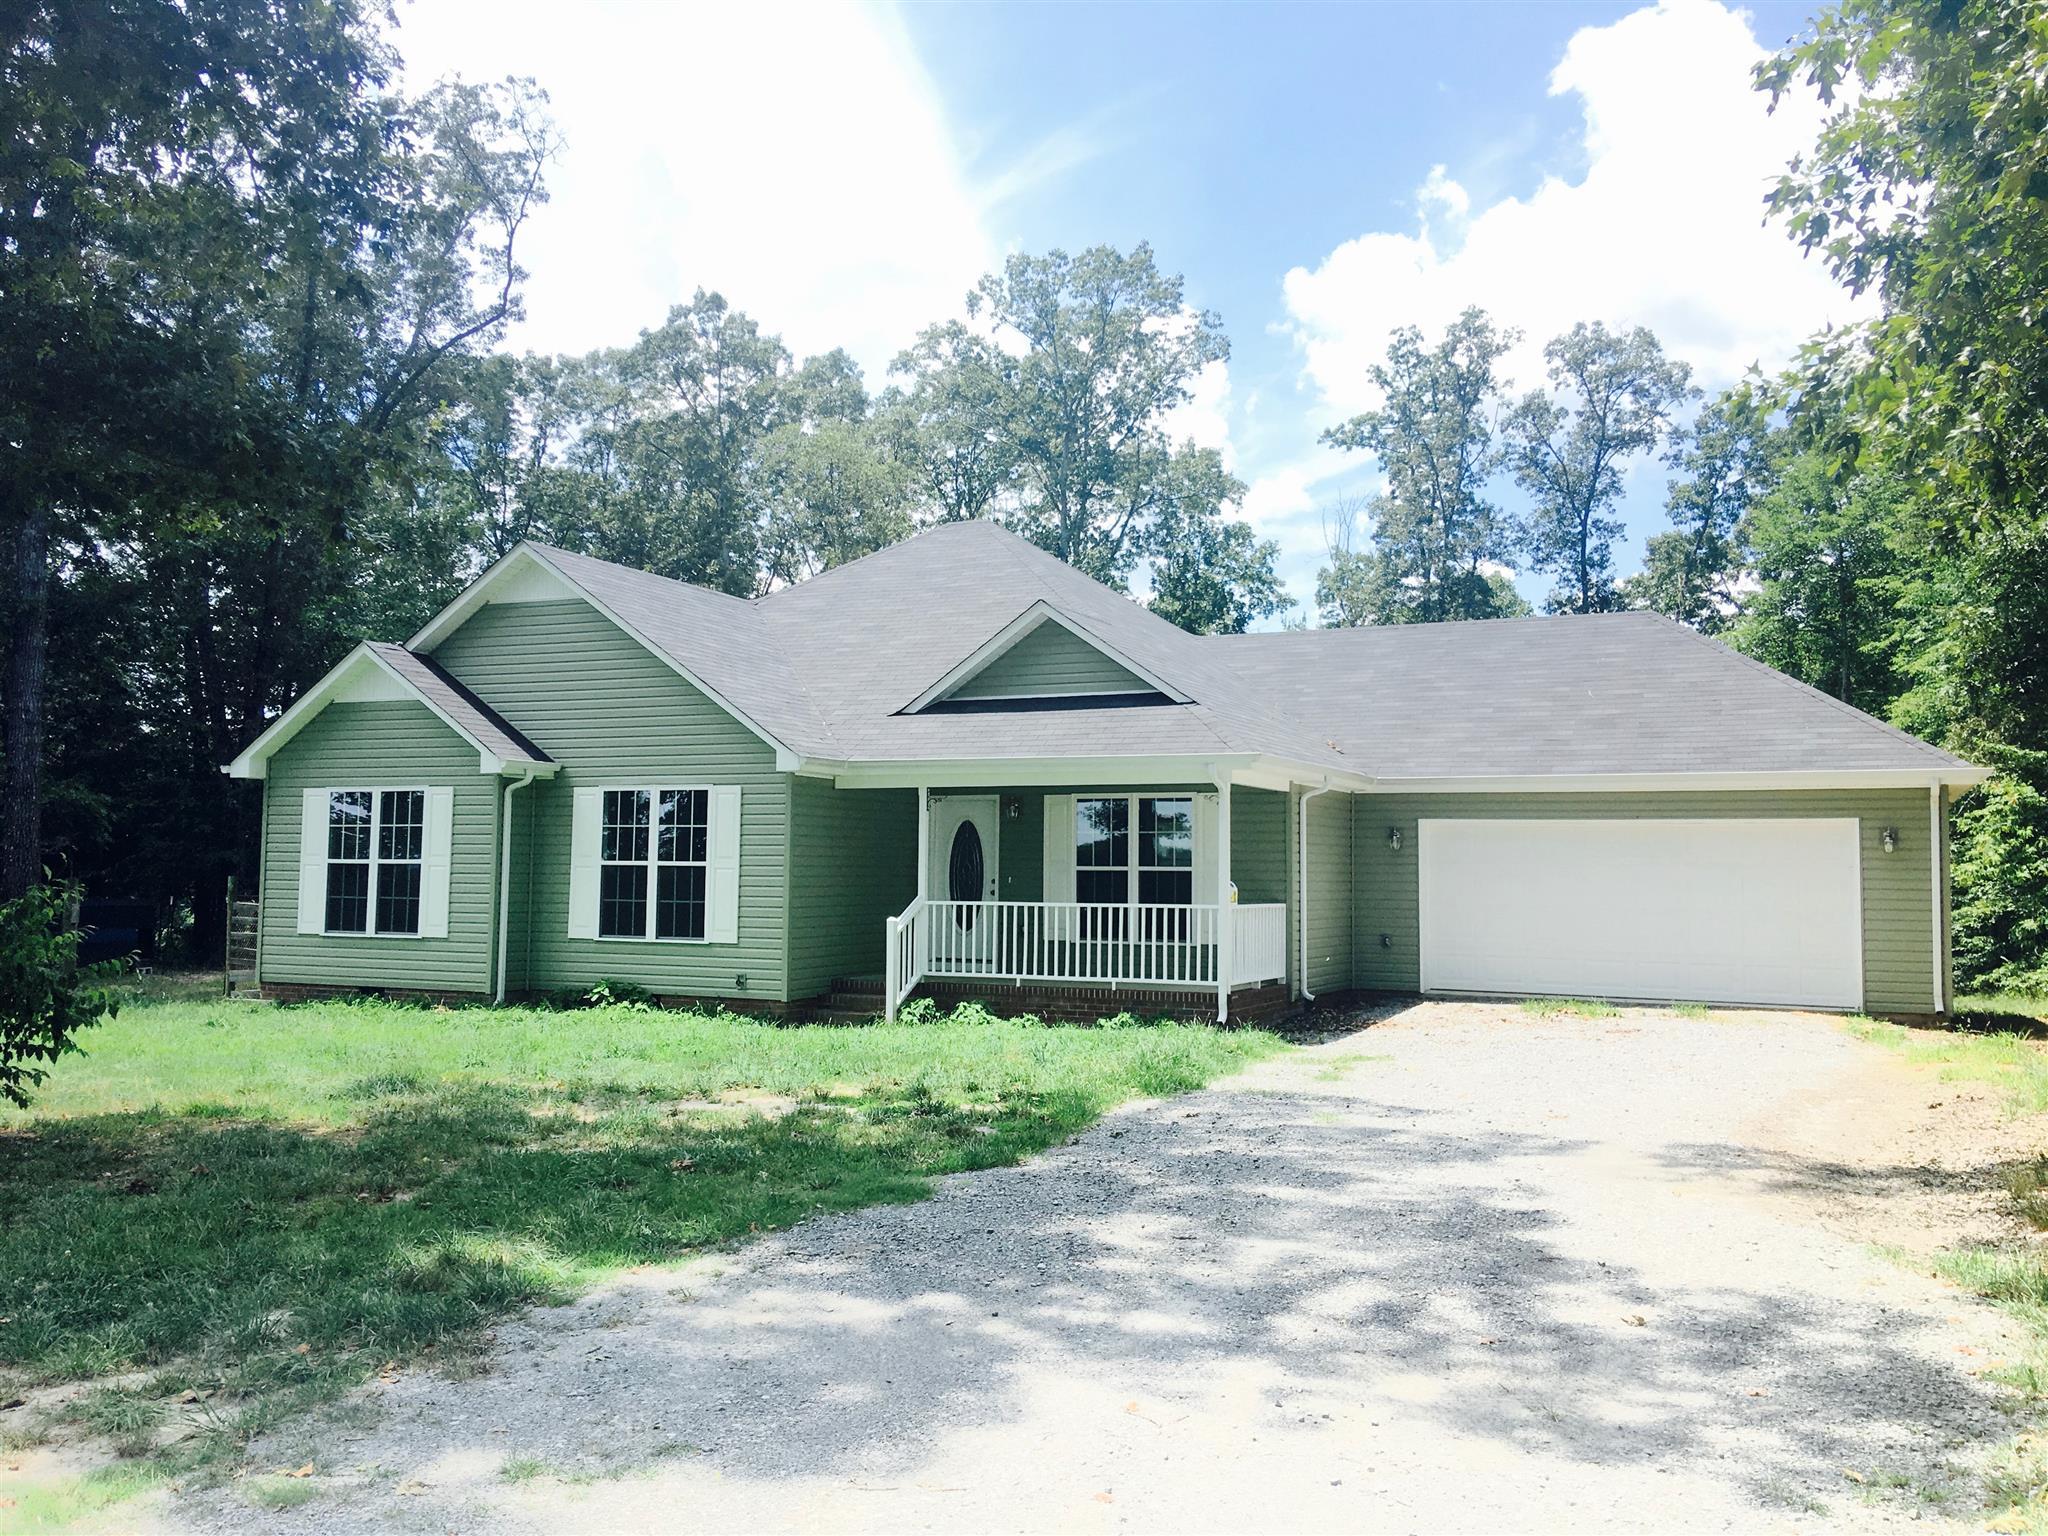 65 Benson School Rd, Kelso, TN 37348 - Kelso, TN real estate listing